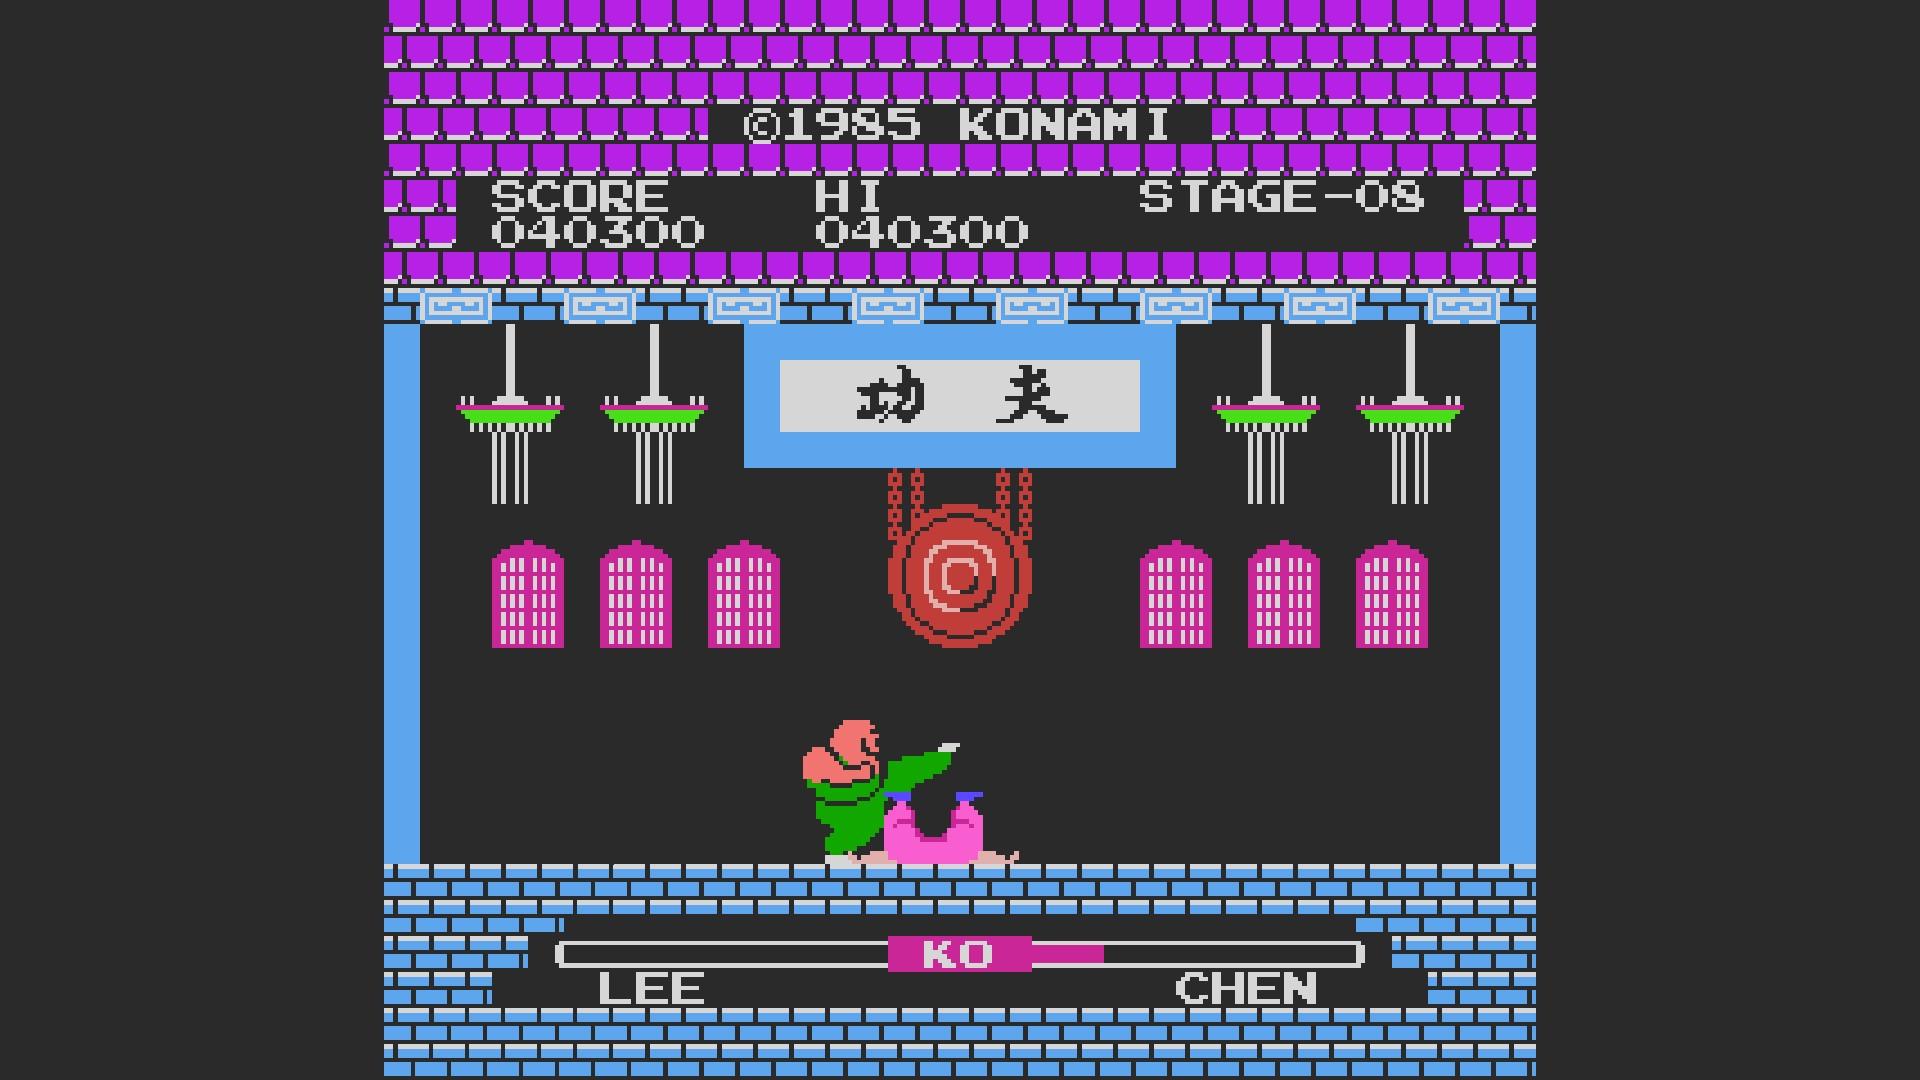 AkinNahtanoj: Yie Ar Kung Fu [Level 1] (NES/Famicom Emulated) 40,300 points on 2020-09-06 13:53:12